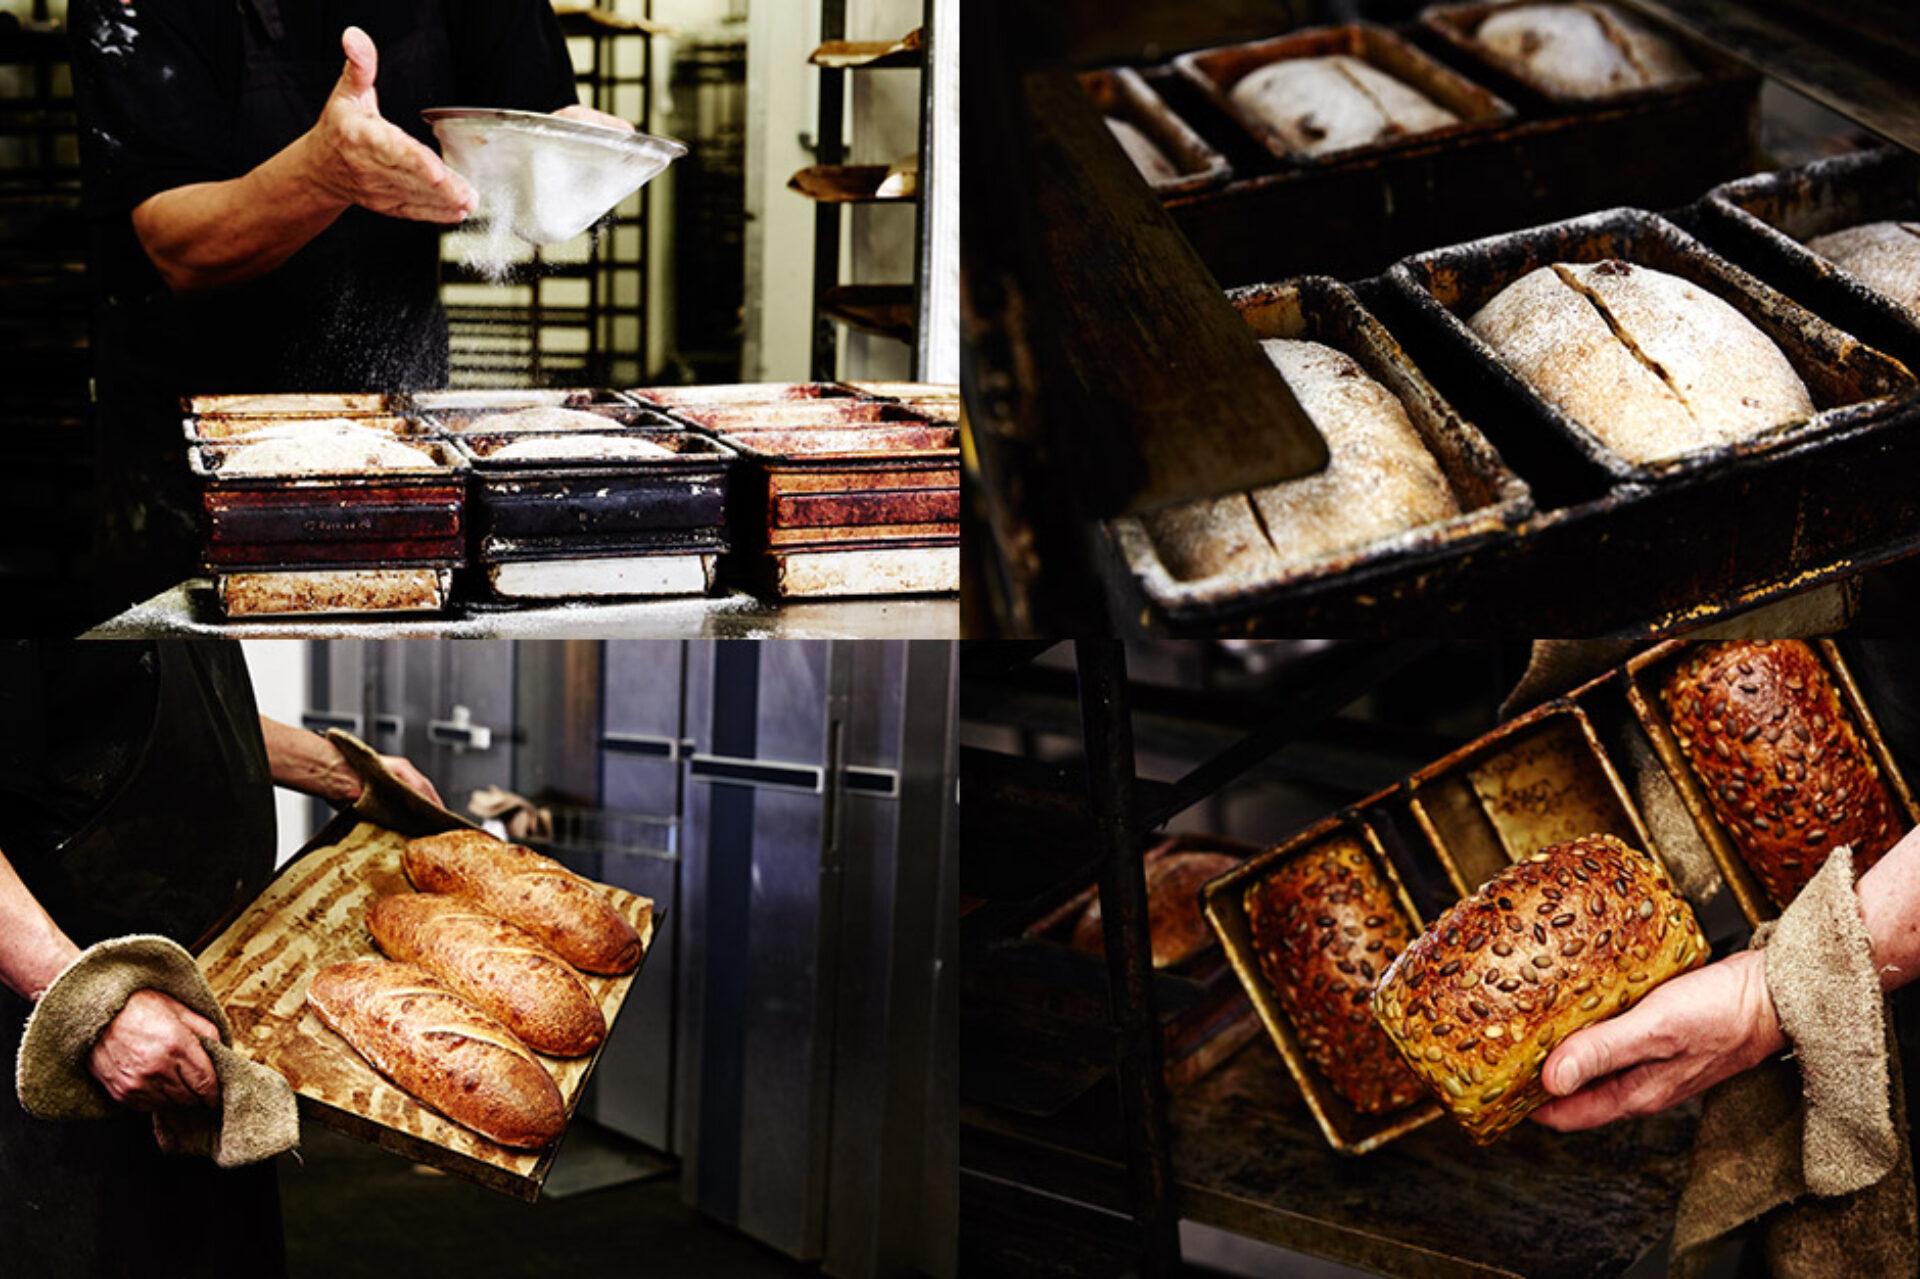 Snows artisan bakers 11